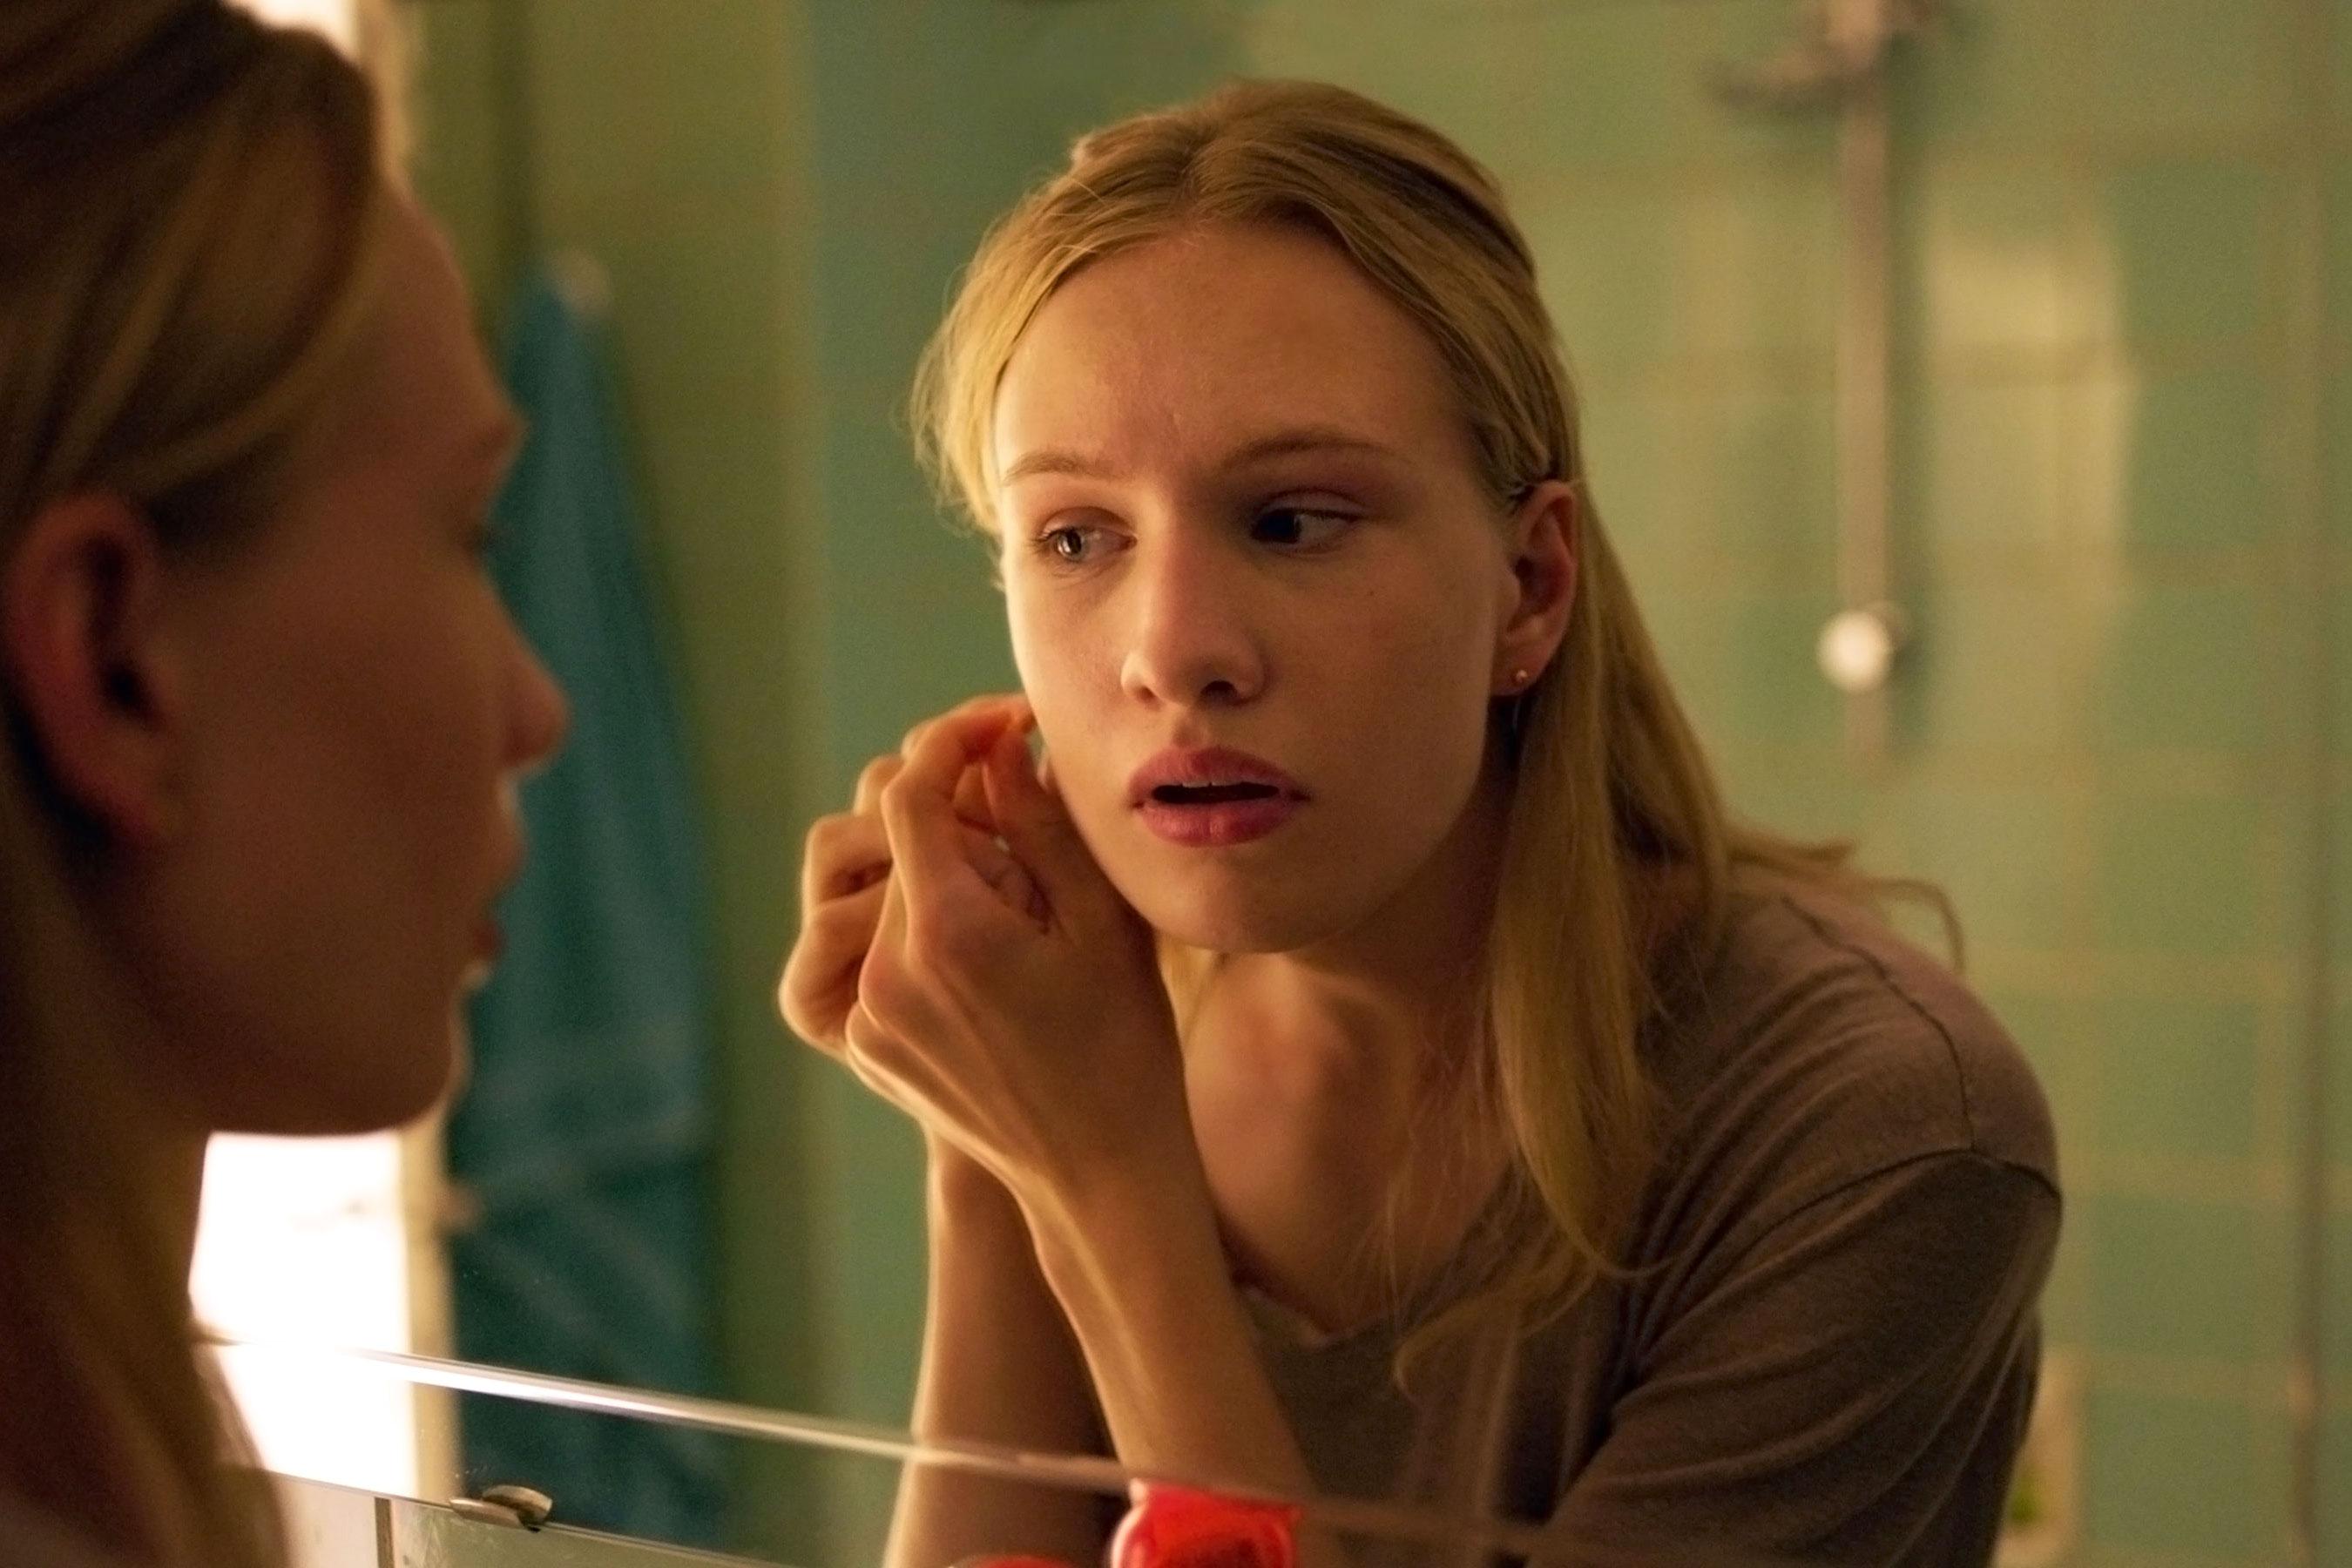 Netflix's Girl Golden Globes backlash explained by trans critics